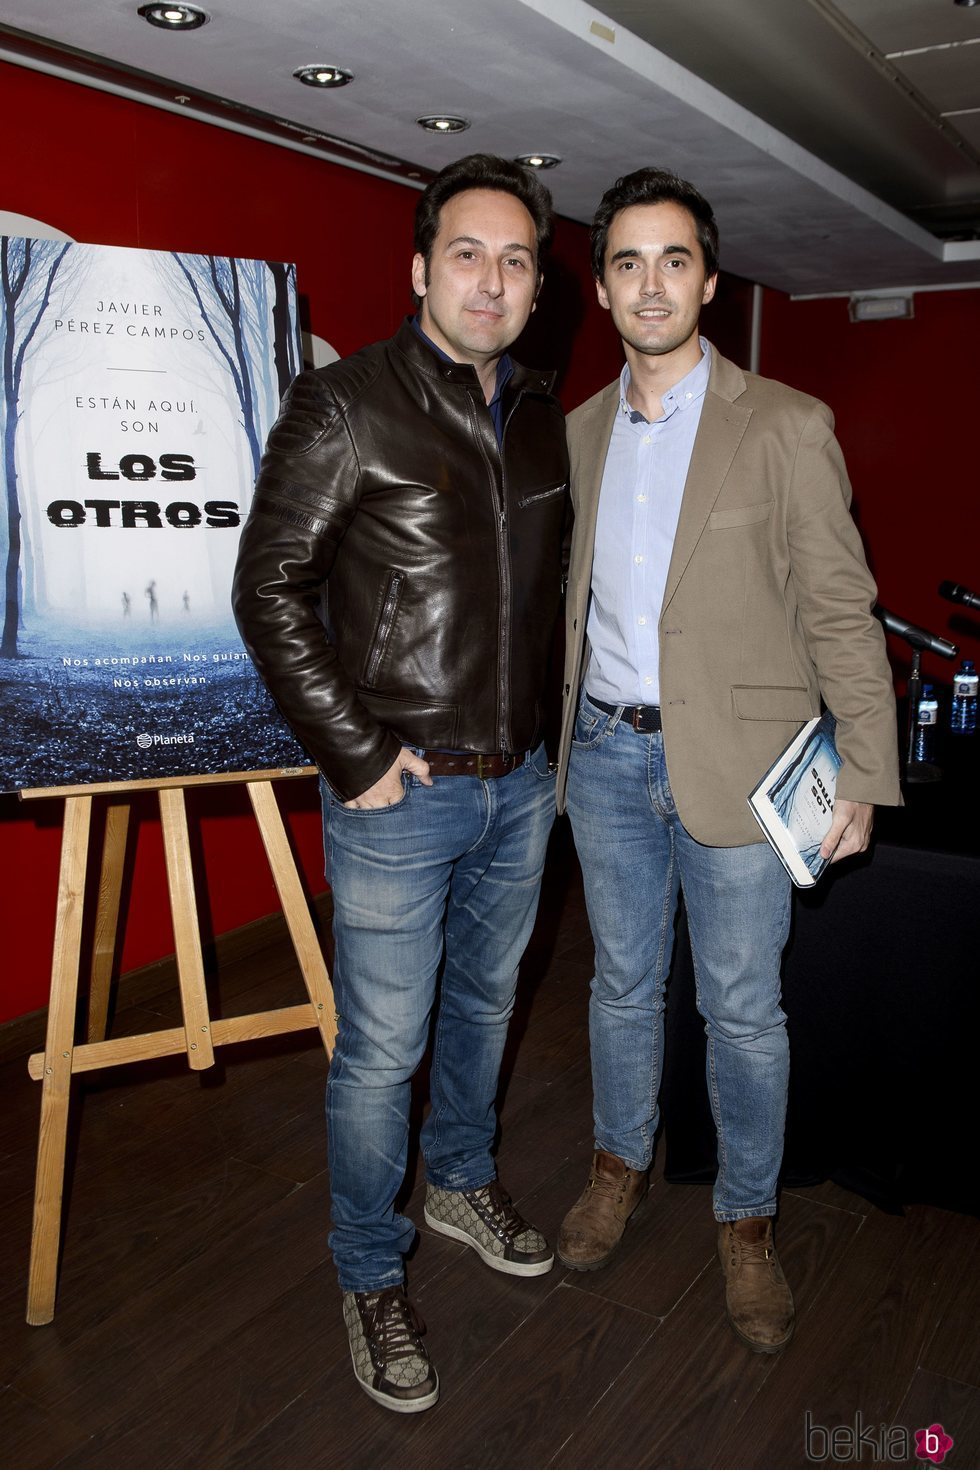 Iker Jiménez y Javier Pérez Campos